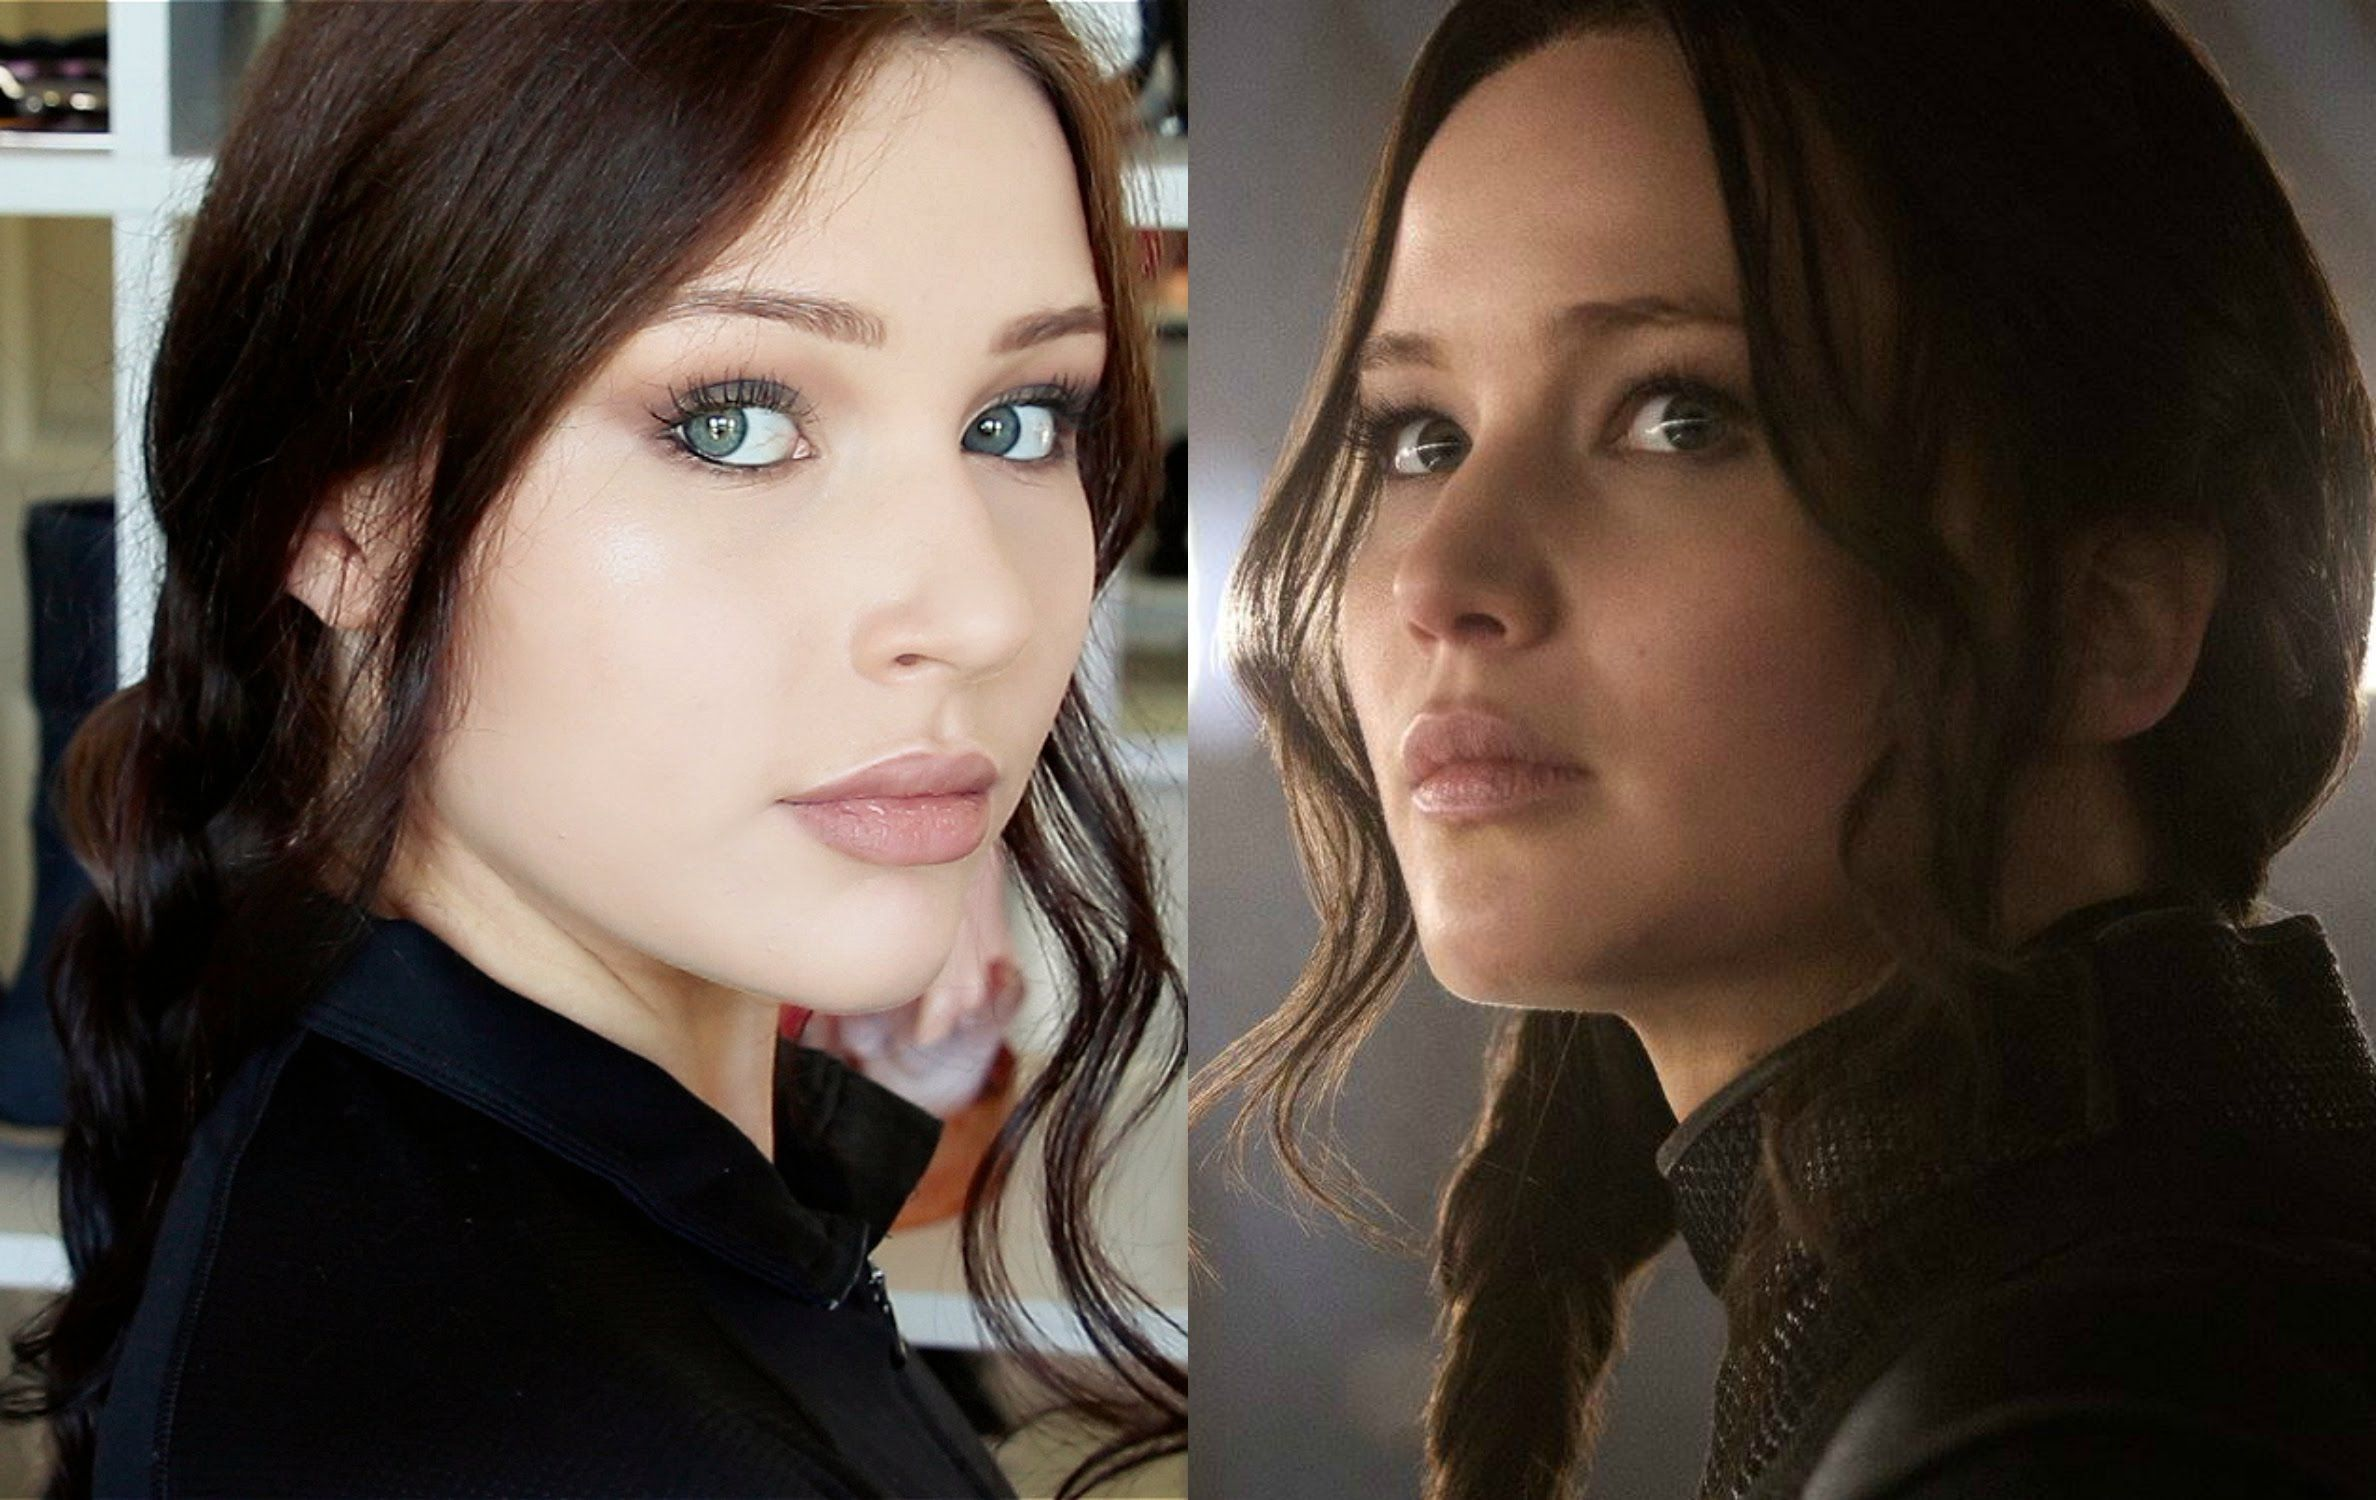 Jennifer Lawrence Mockingjay Makeup Tutorial I always liked Katniss  Everdeen Makeup from The Hunger Games Mockingjay 71d4bc8c6e642